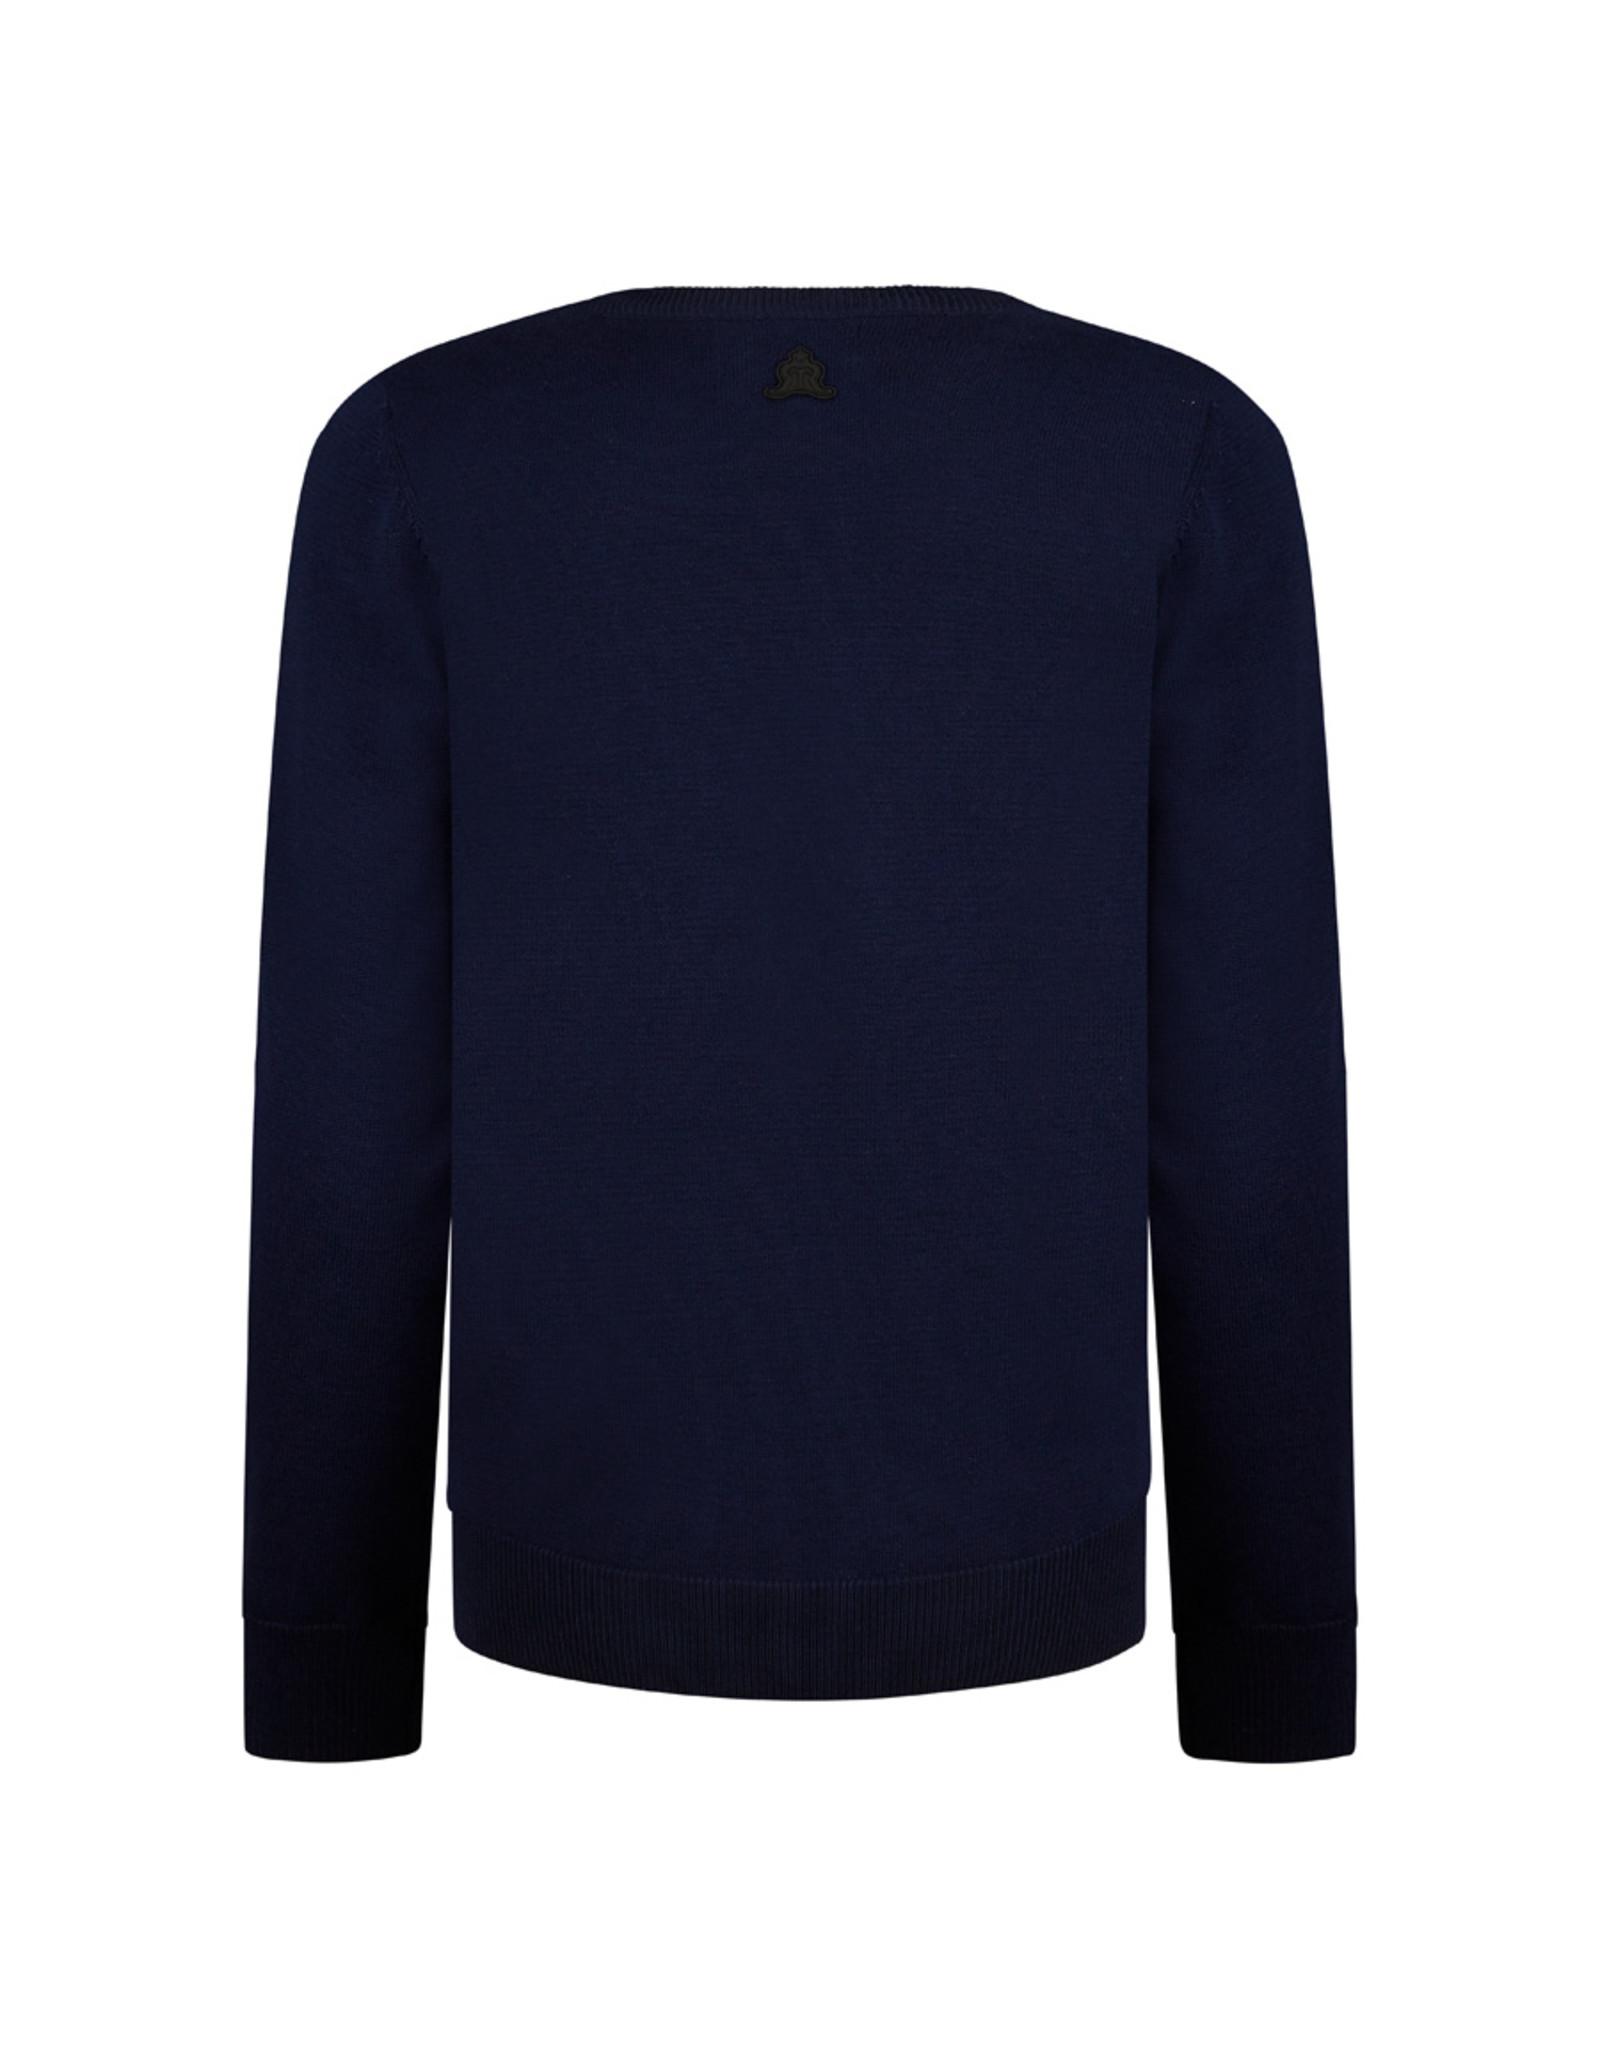 Retour Jeans Knitwear Colin dark navy